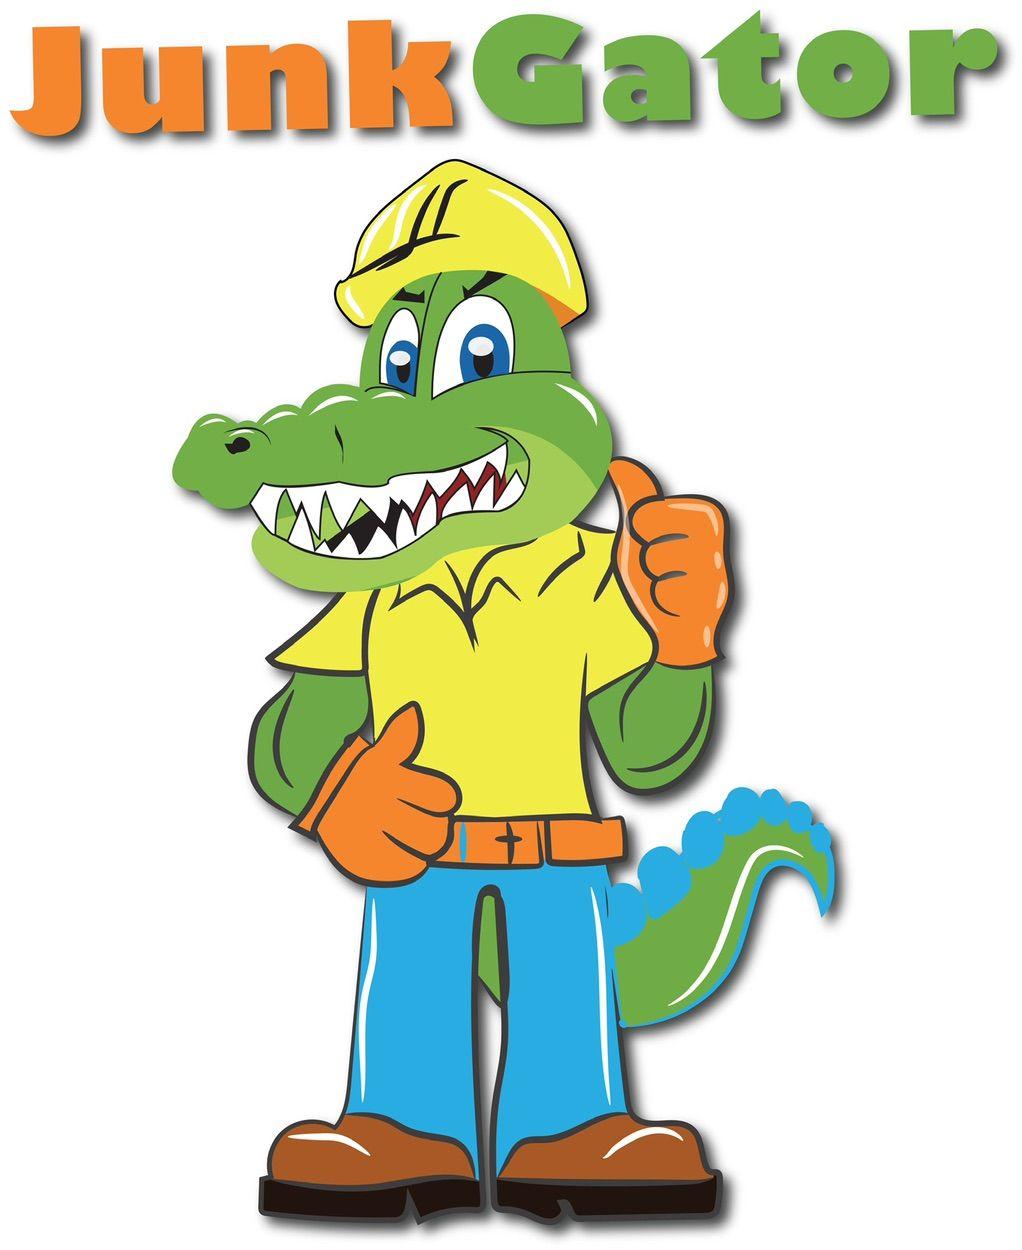 The Junk Gator LLC